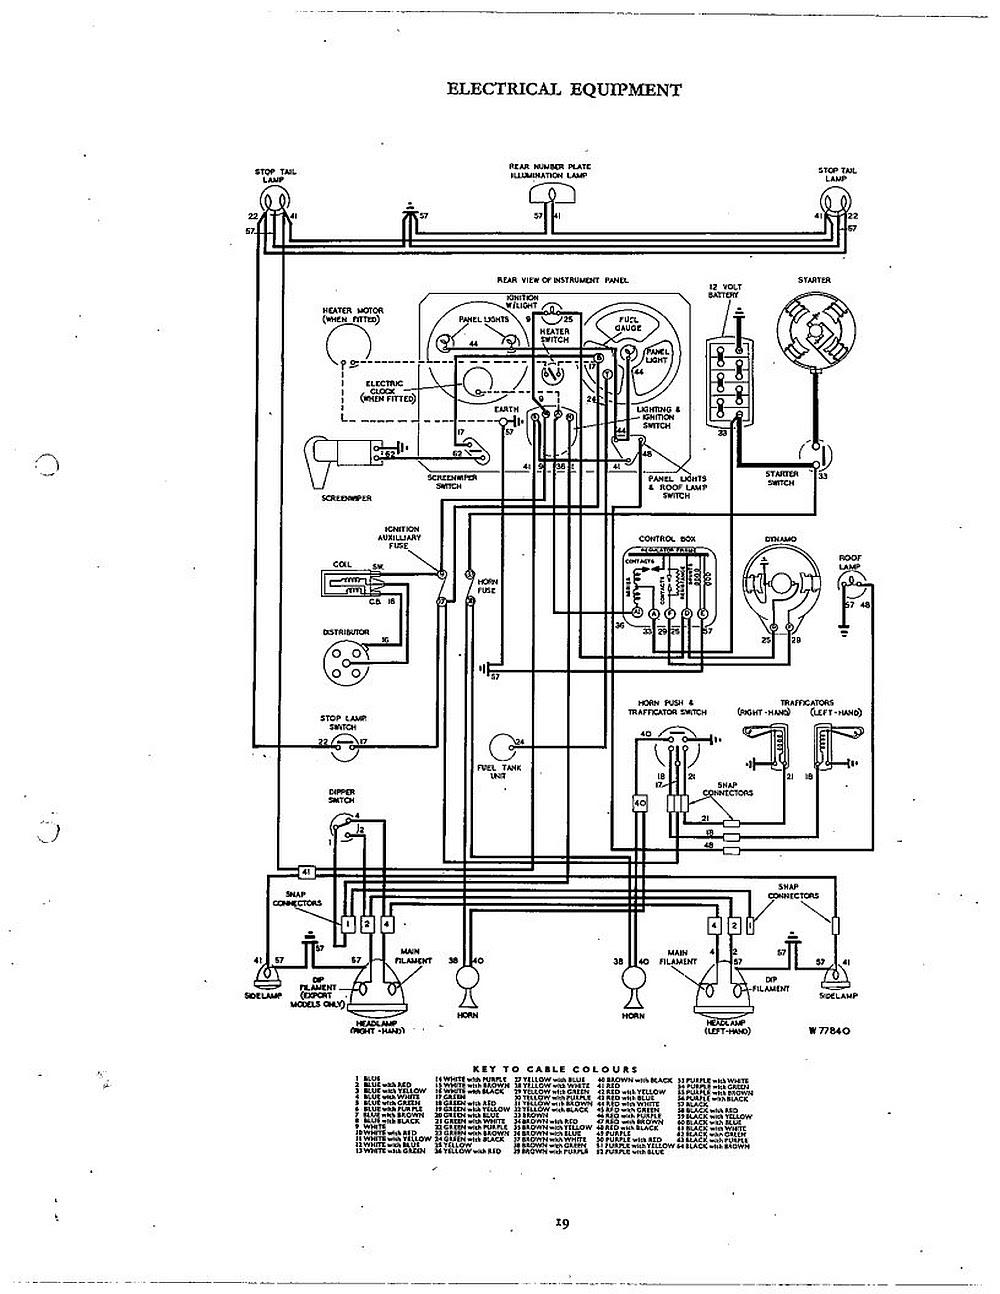 Diagram Norton Mkiii Wiring Diagram Full Version Hd Quality Wiring Diagram Goldwiring18 Newsetvlucera It